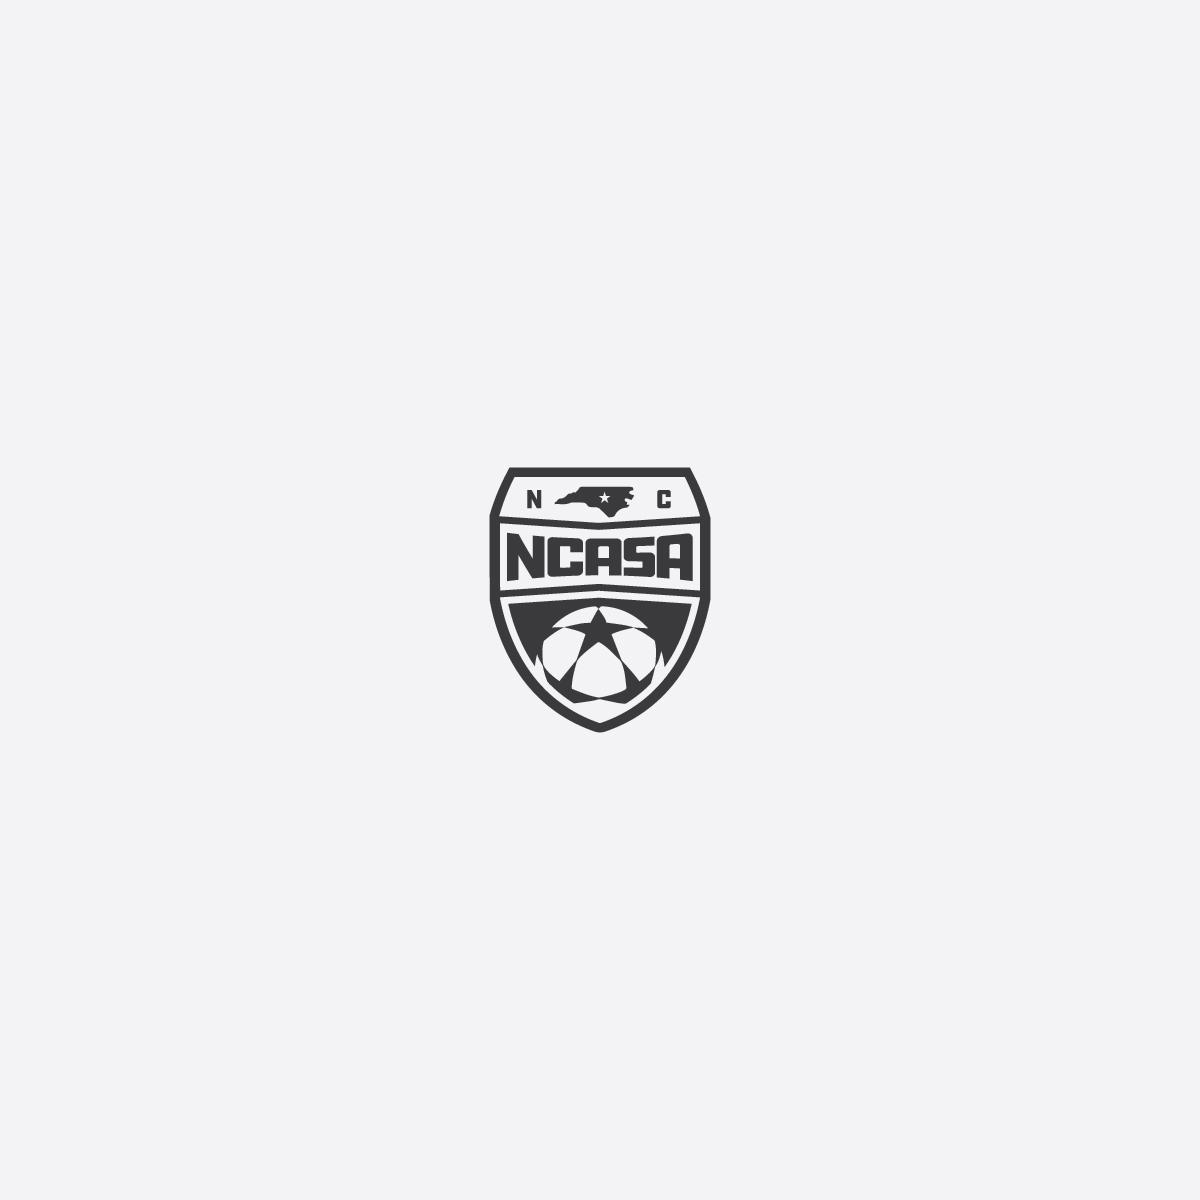 NCASA_10.1.17-01.jpg